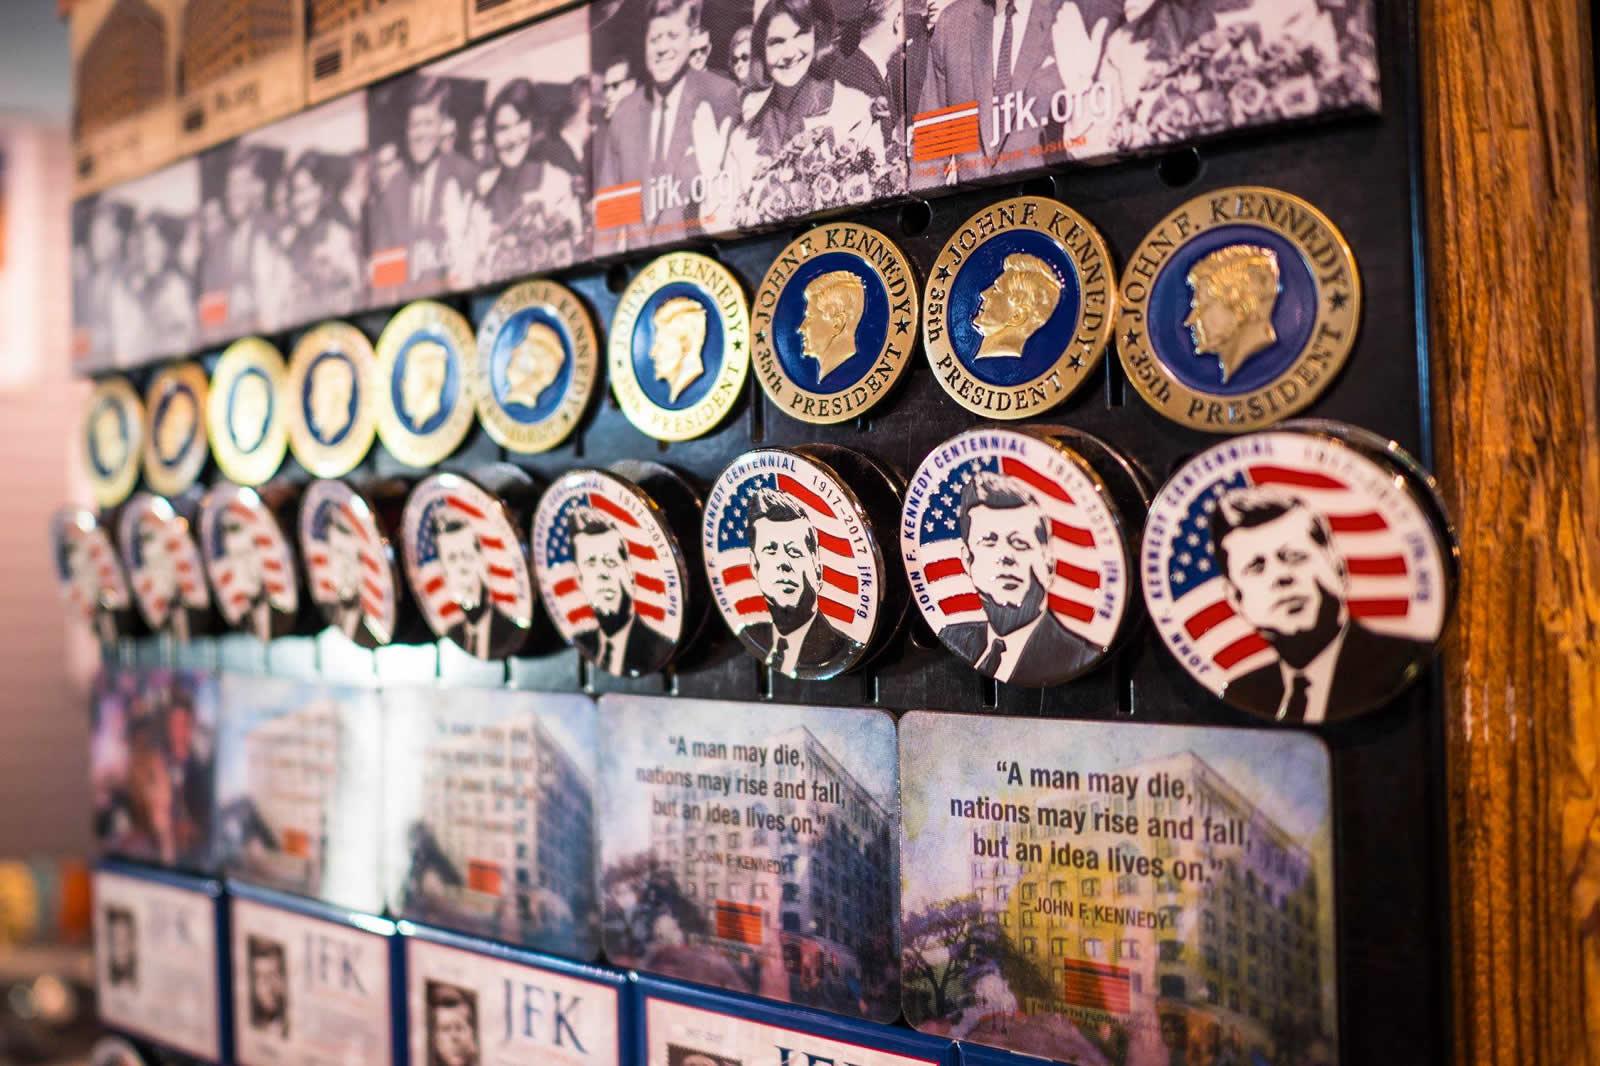 6th Floor Museum de Dallas – Hommage à JFK